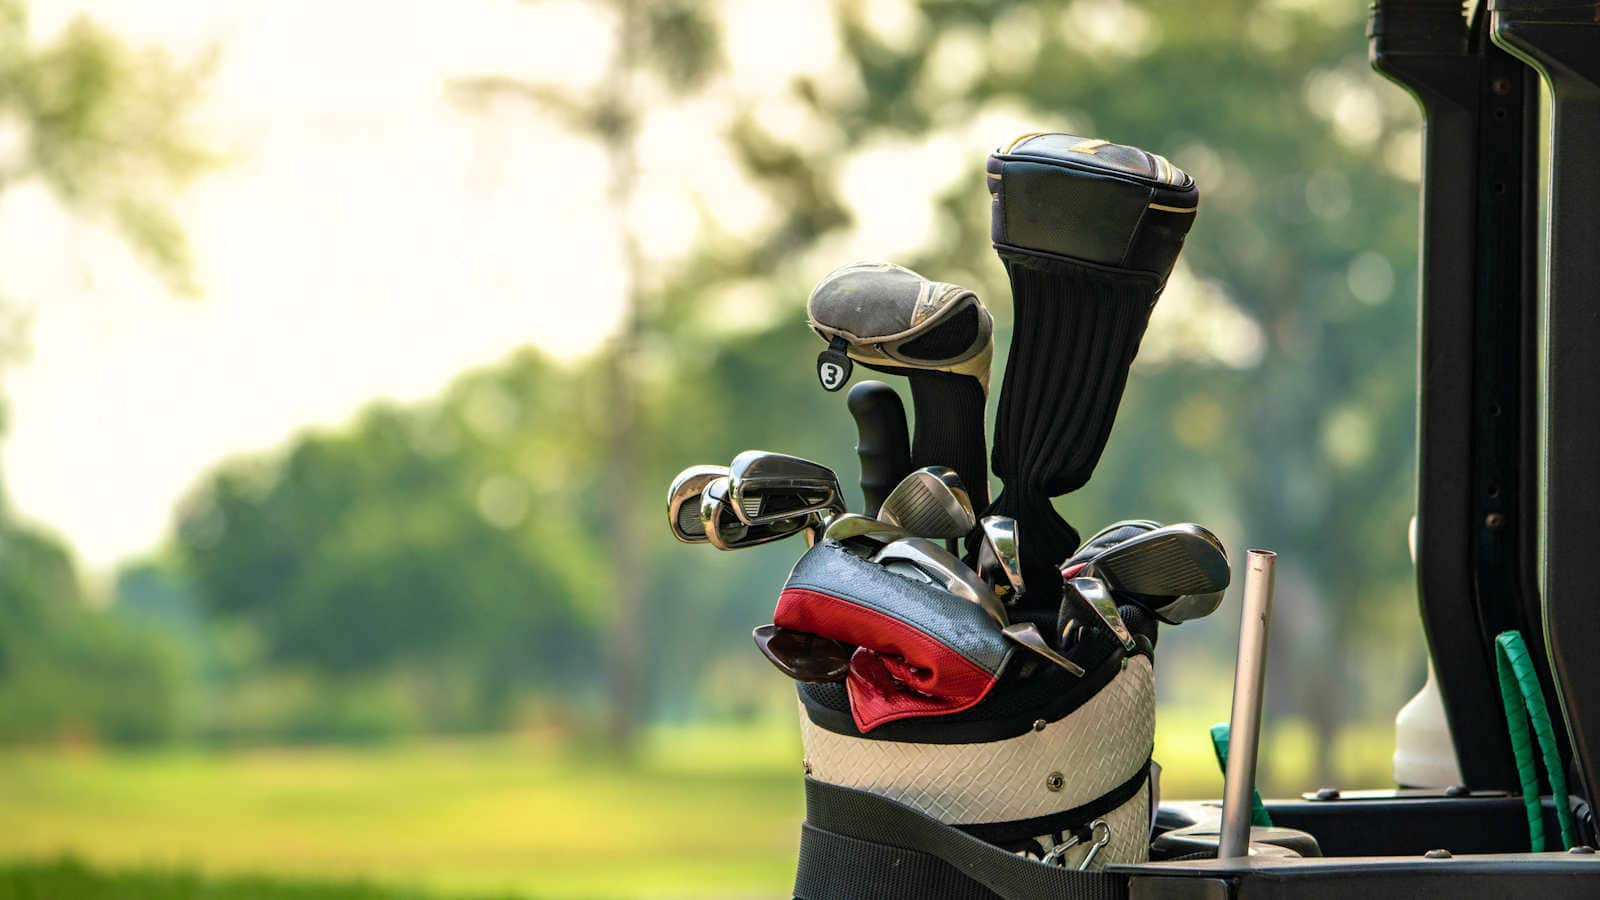 WestAviat Golf Club of Maida Vale